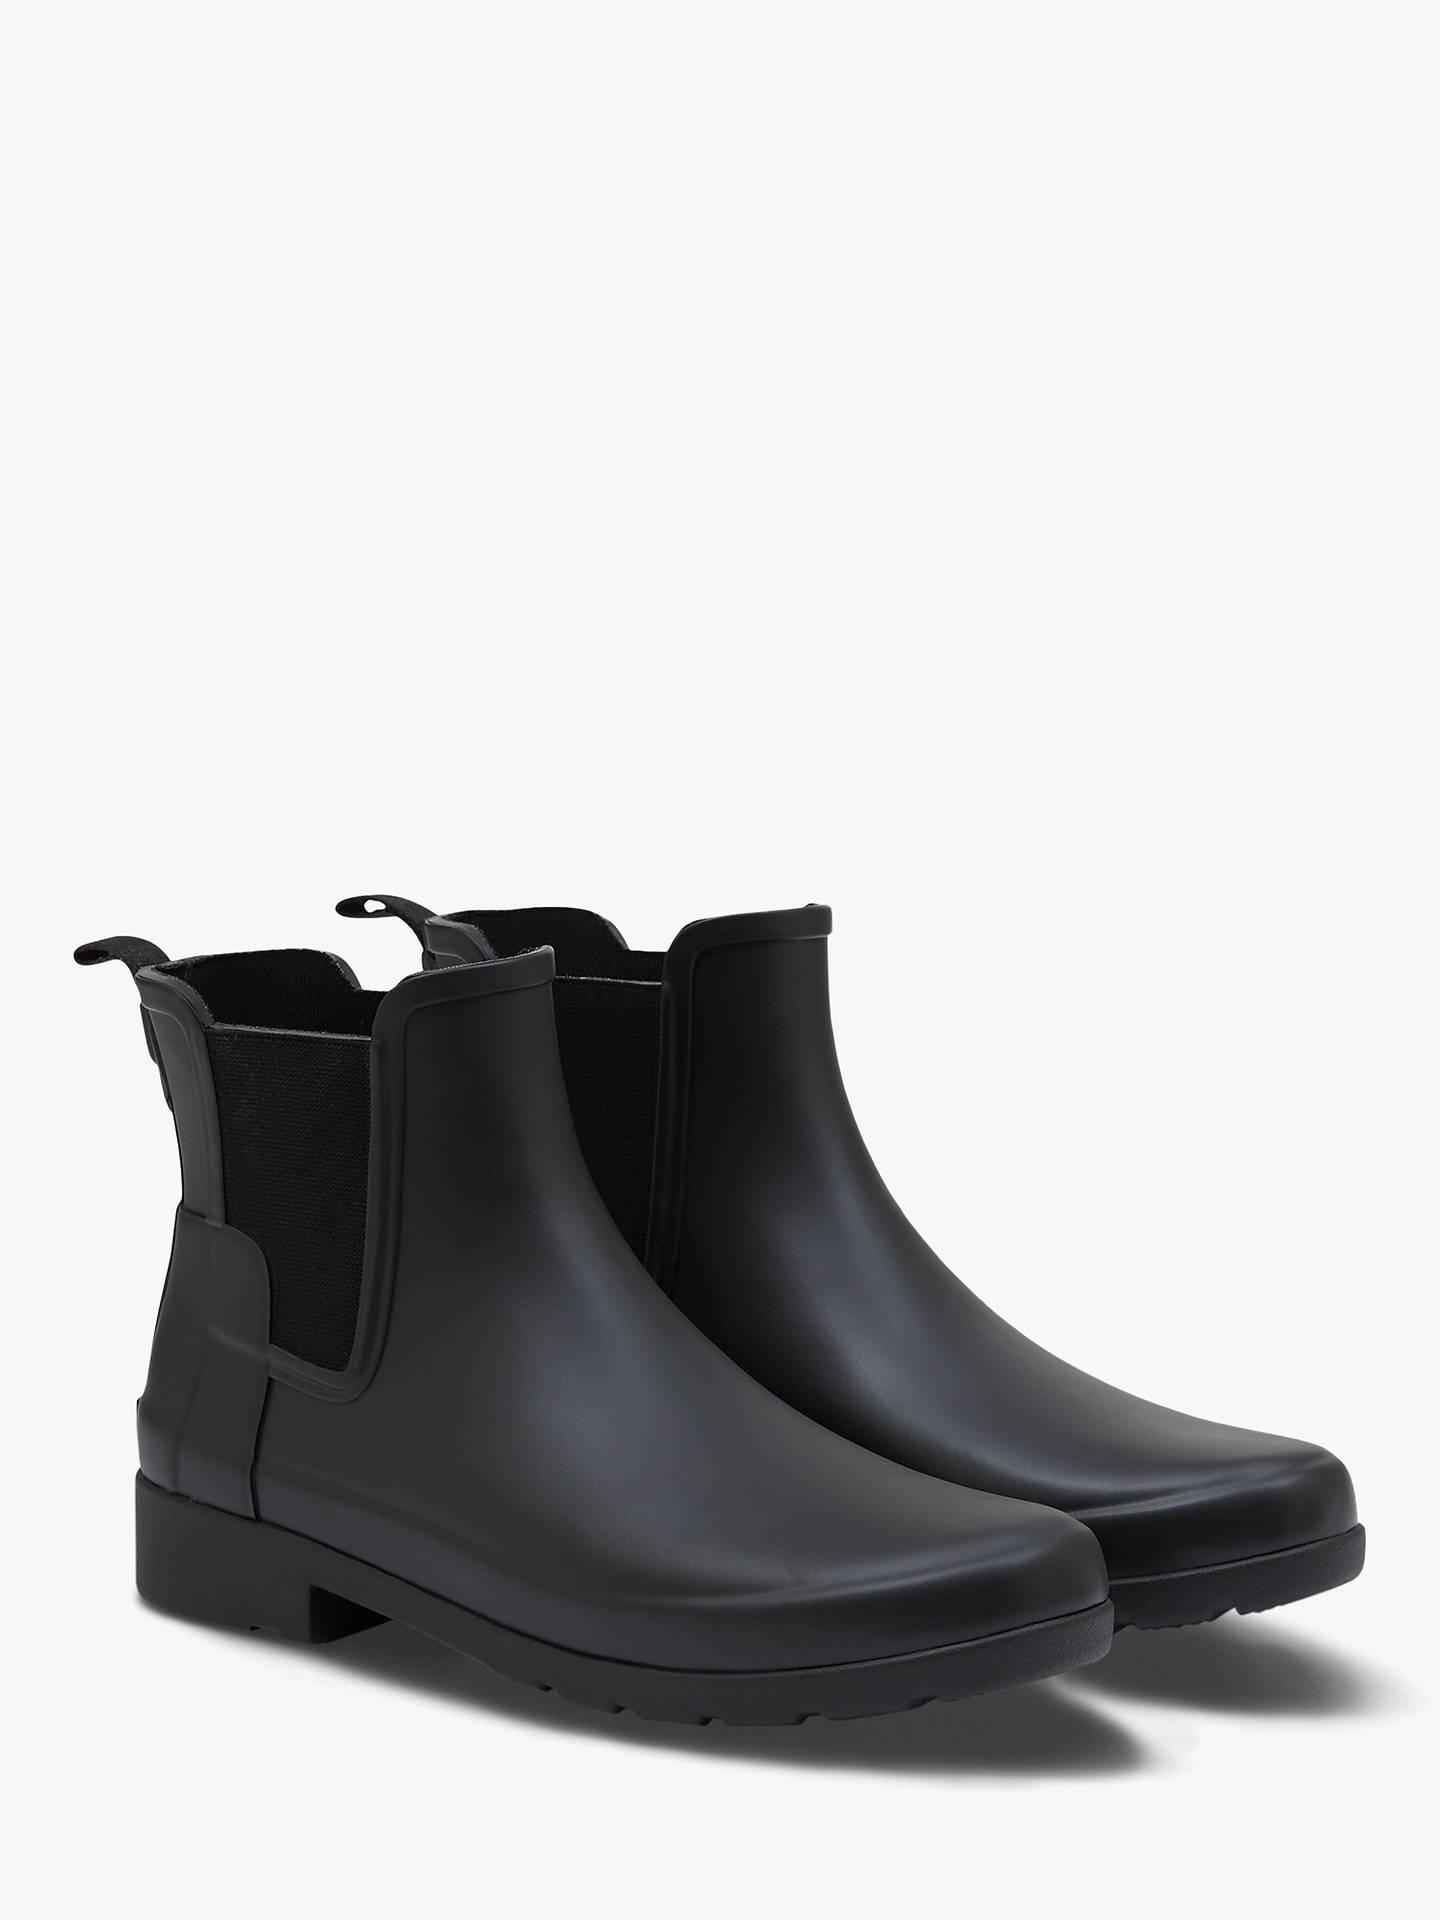 e14f1ea6242 Hunter Women's Original Waterproof Refined Chelsea Wellington Boots, Black